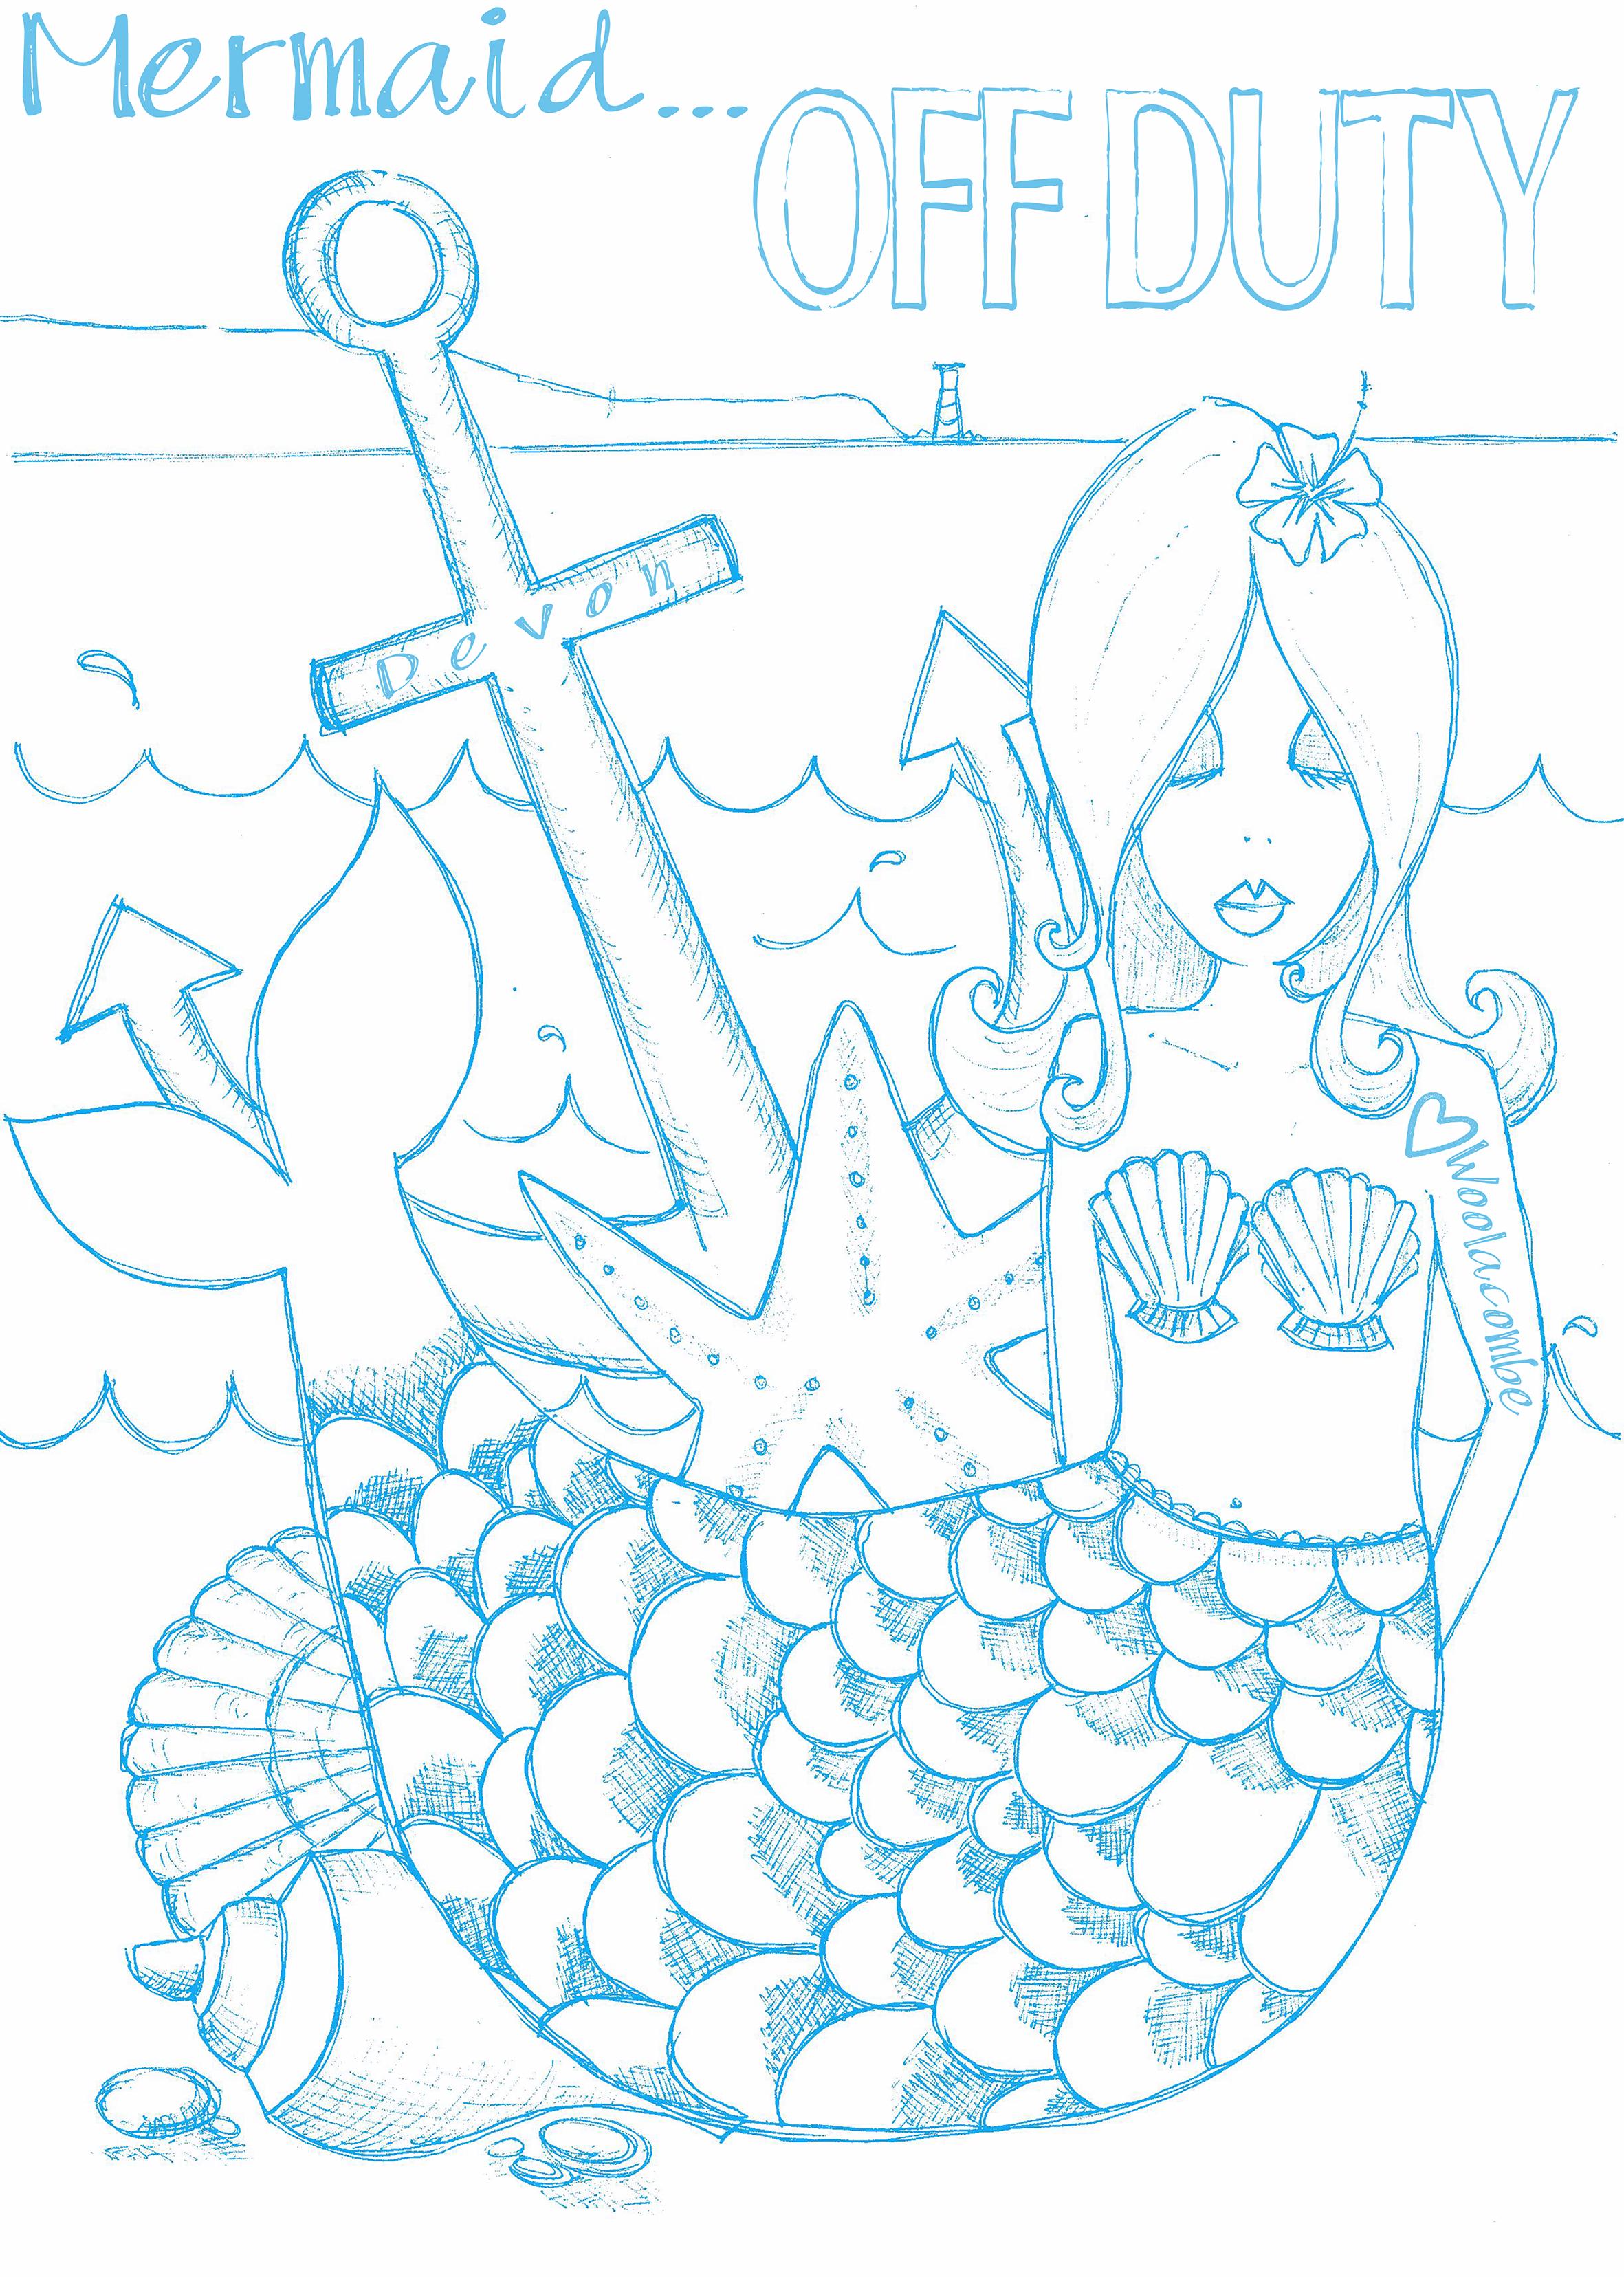 Tea towel. Off Duty Mermaid